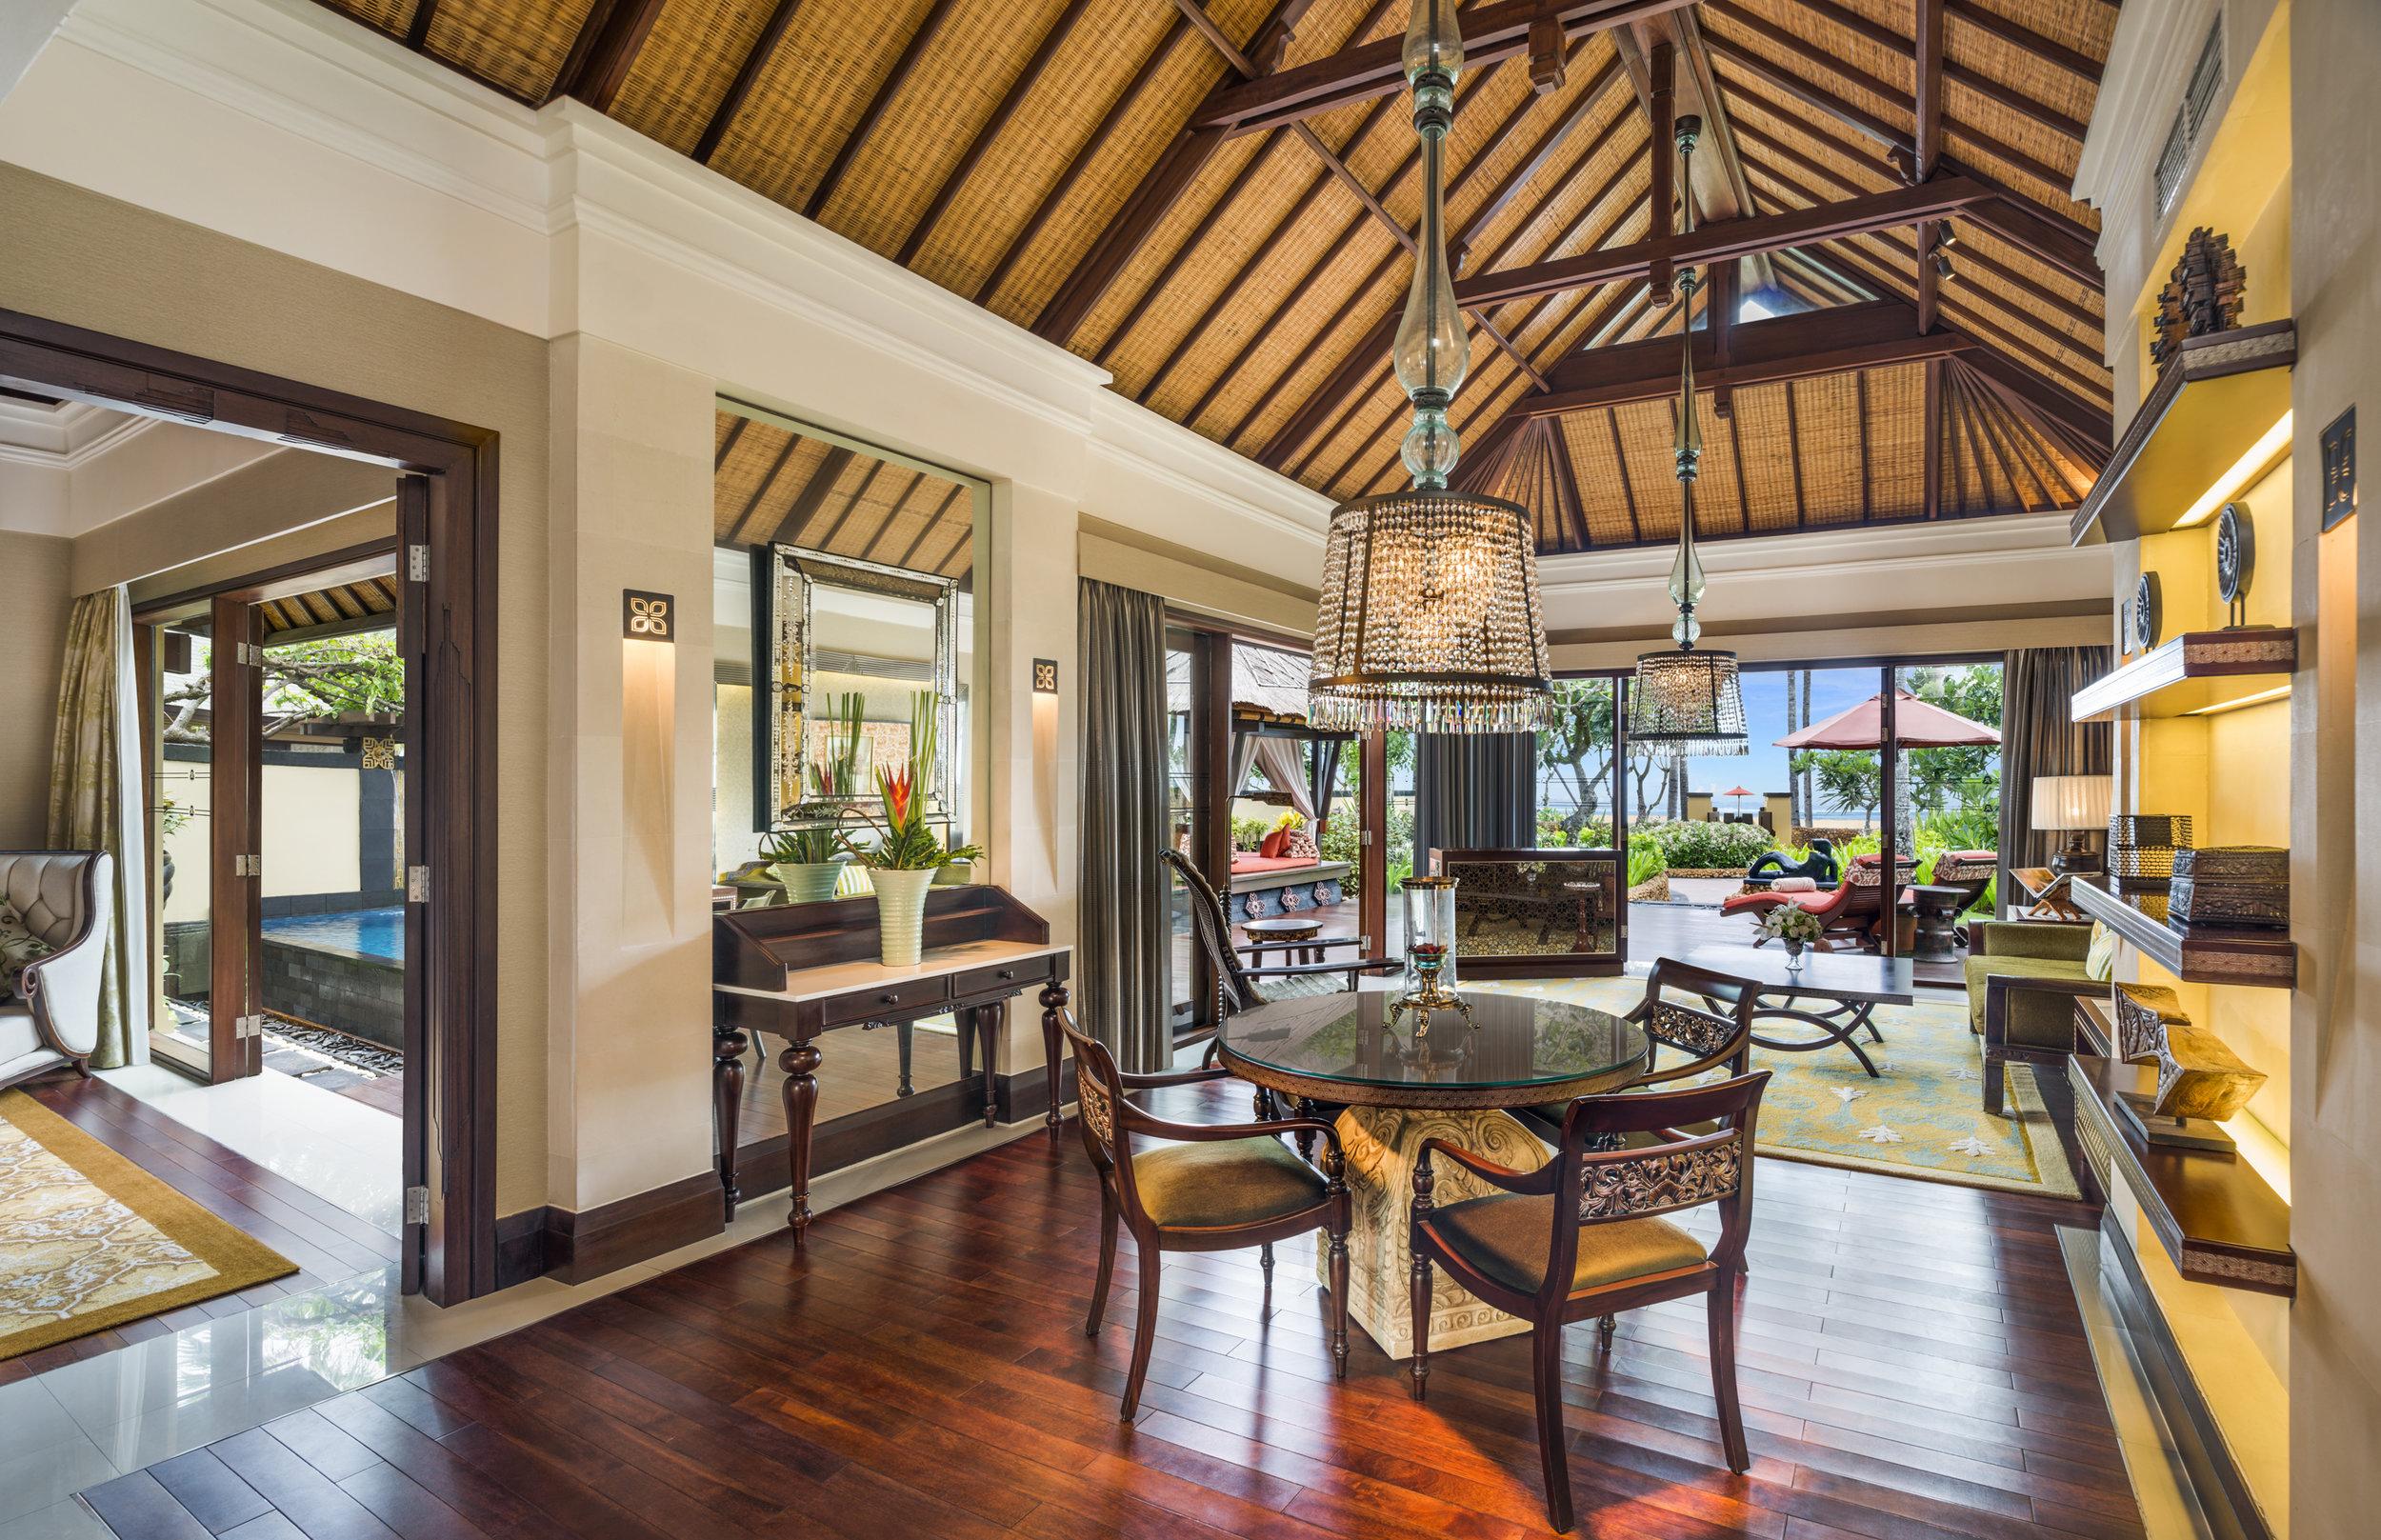 St Regis Bali The Strand Villa - Living Room.jpg